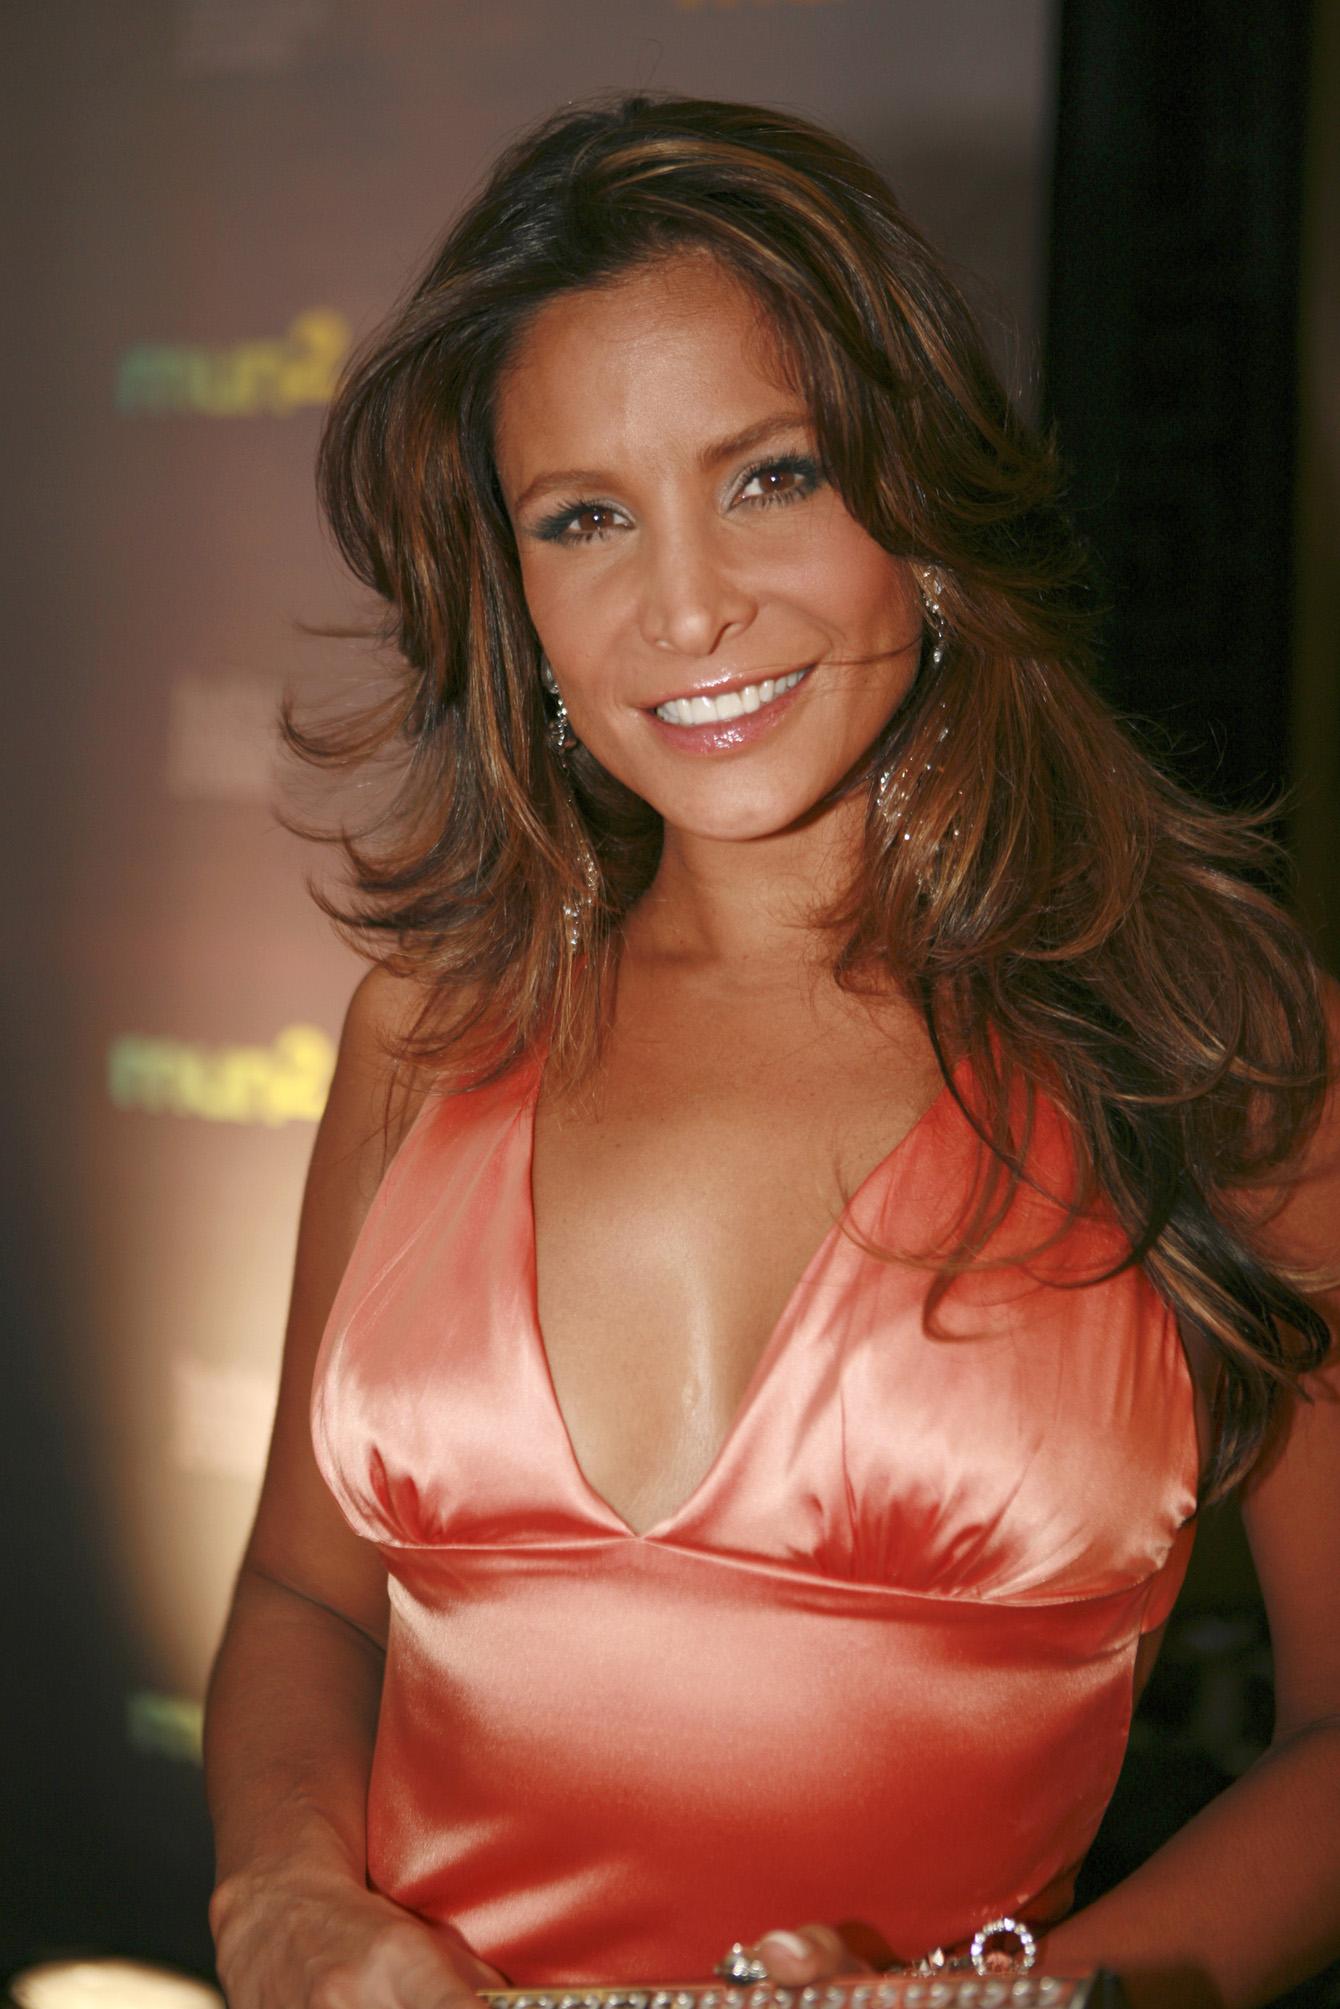 Lorena Rojas at the 2007 Telemundo Upfront event on May 15, 2007.